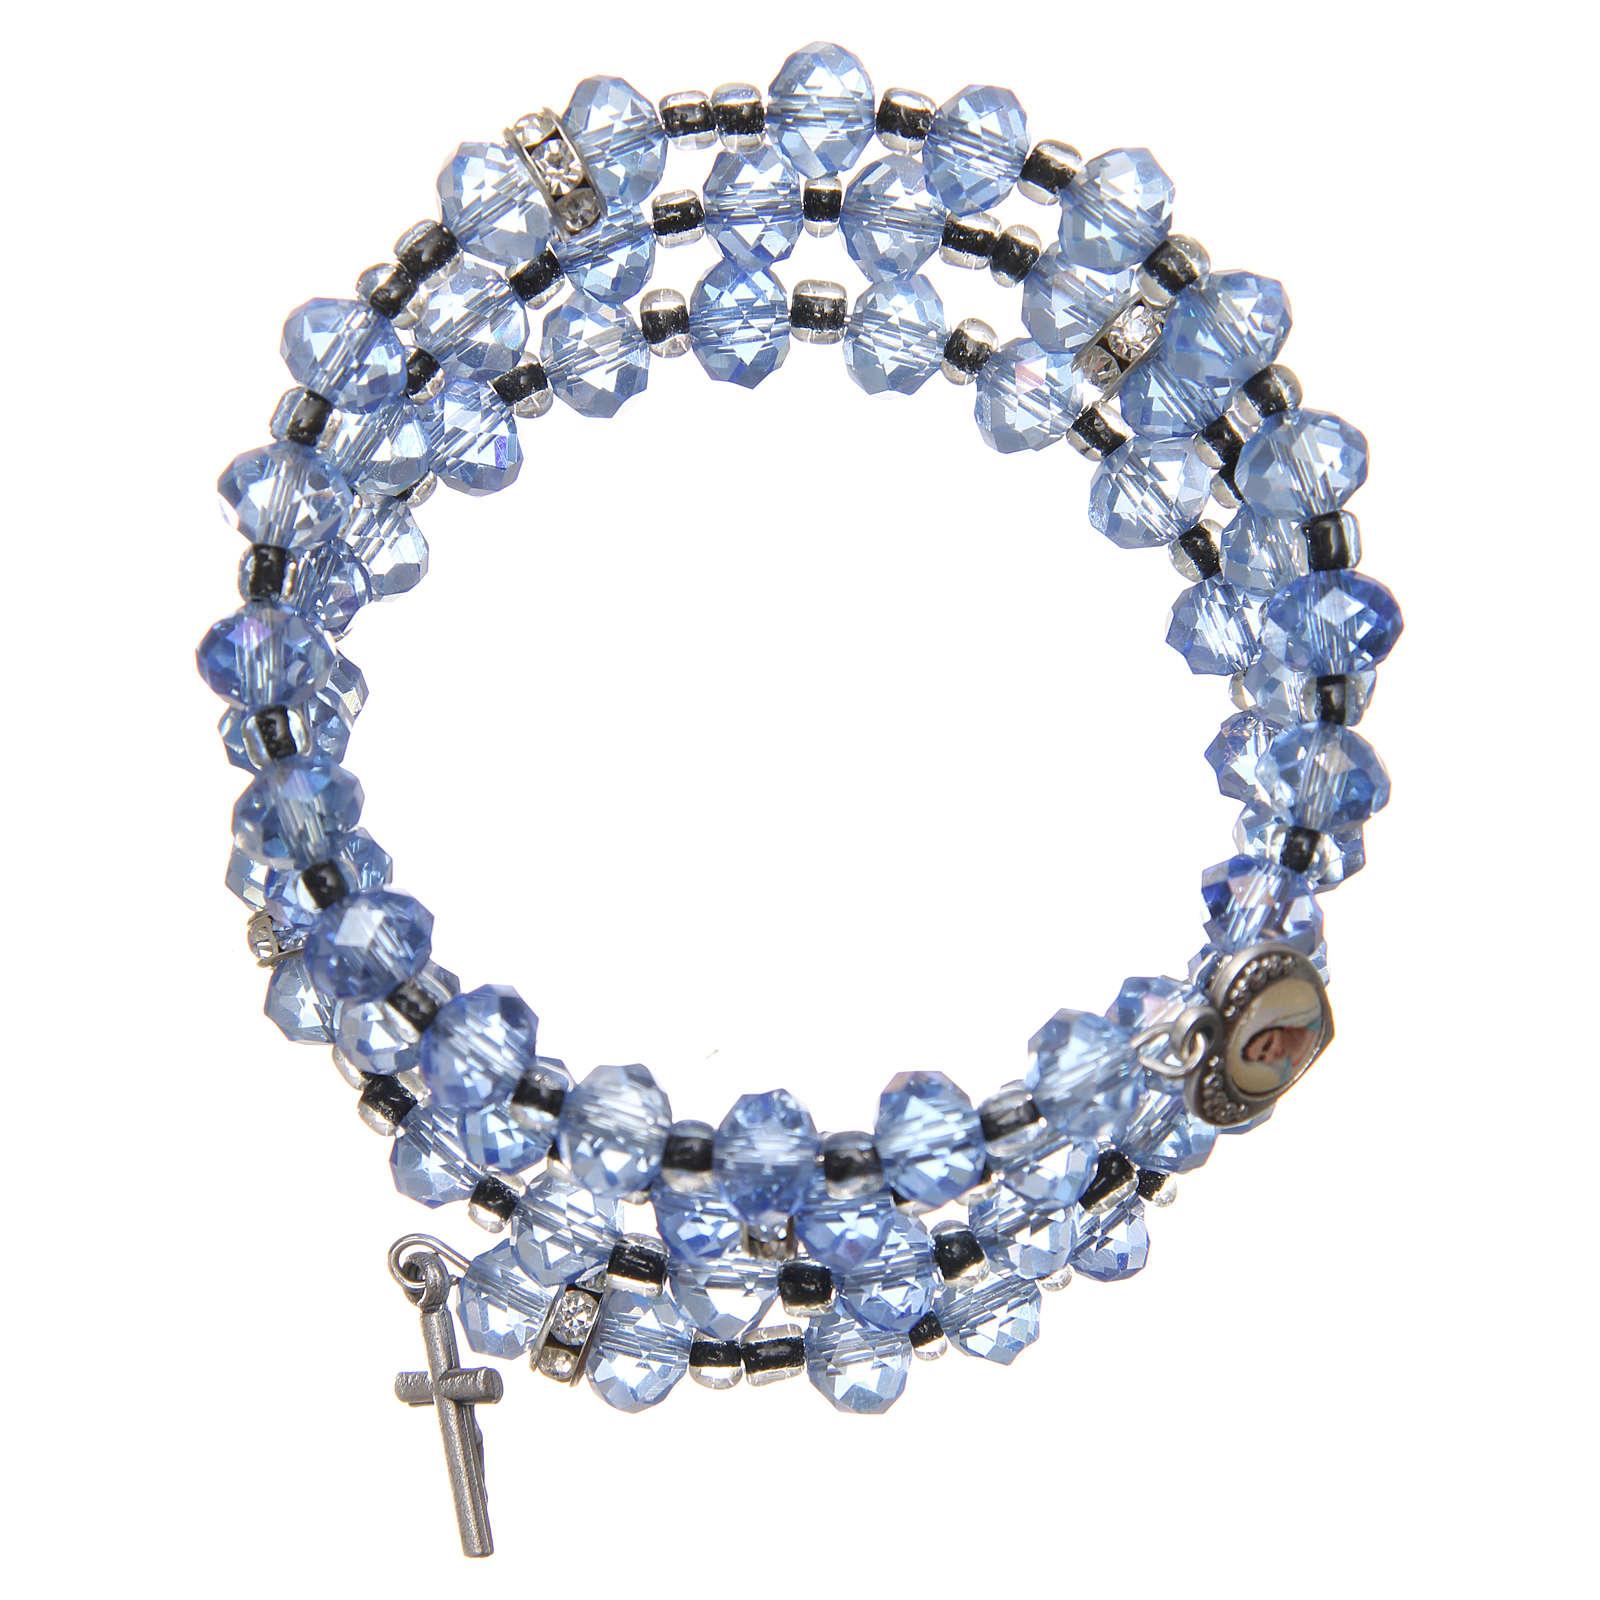 Bracelet à ressort perles bleu clair croix Notre-Dame Medjugorje 4